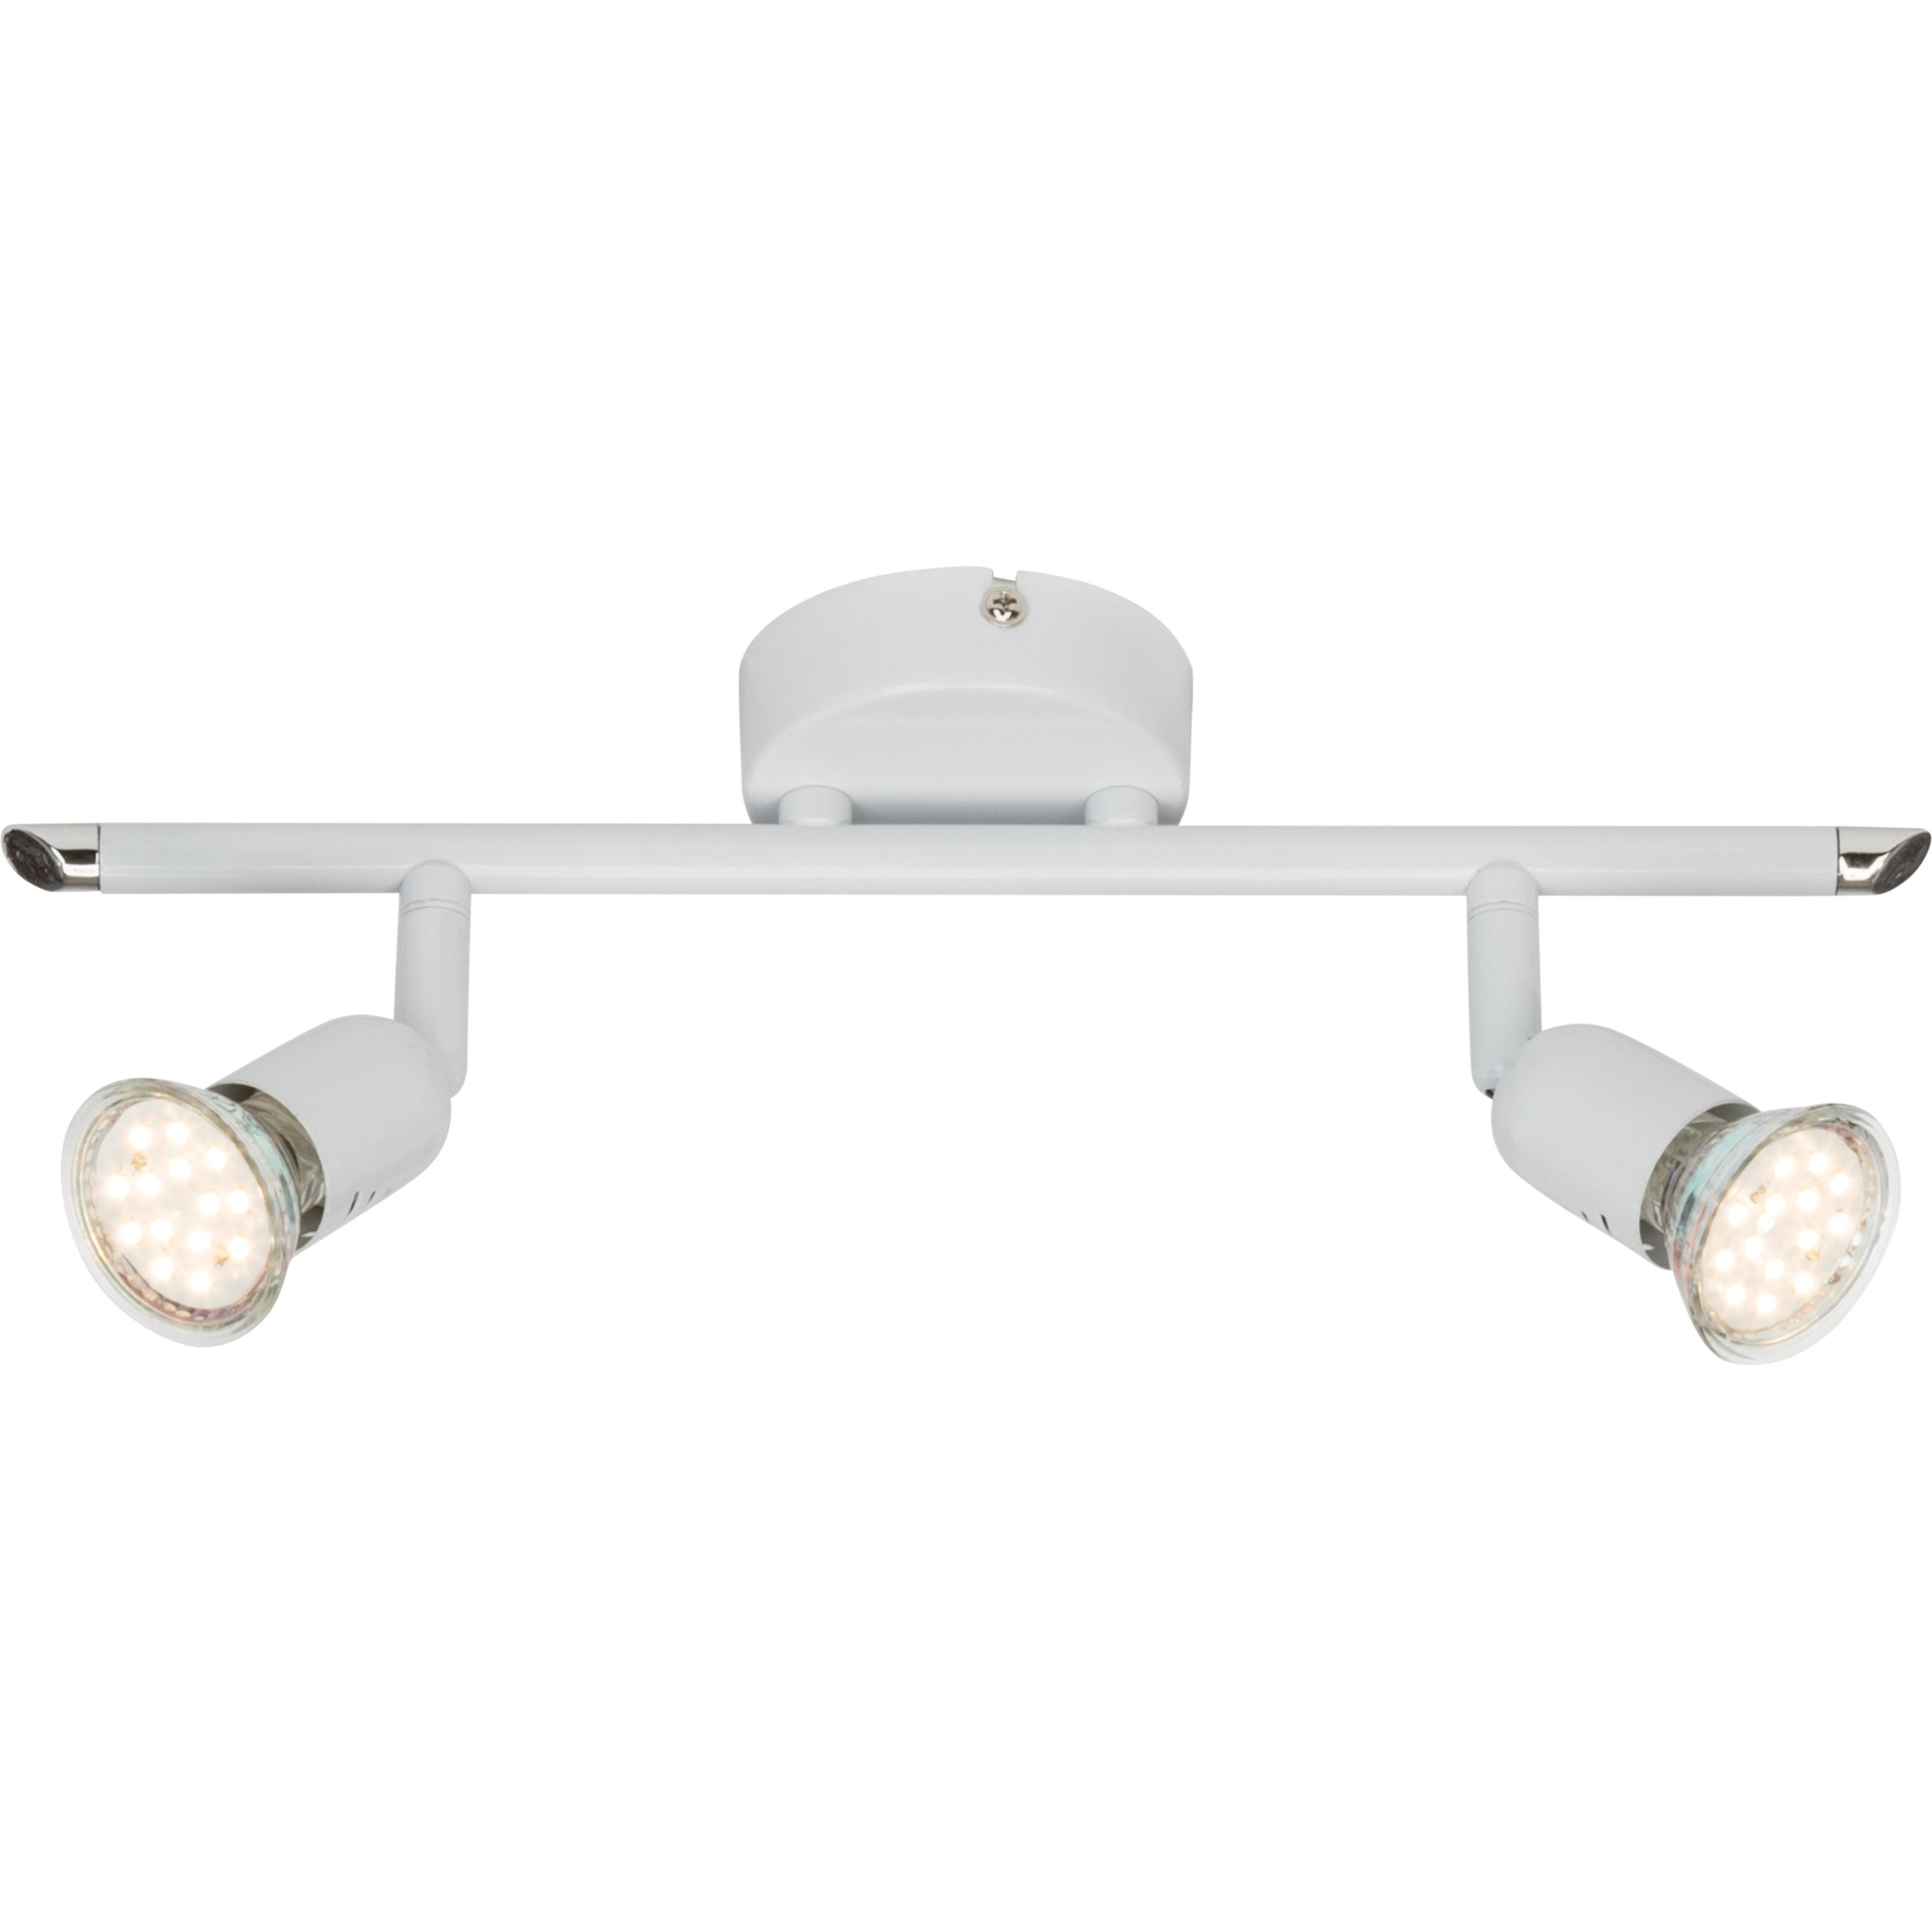 Brilliant Leuchten Loona LED Spotrohr 2flg weiß